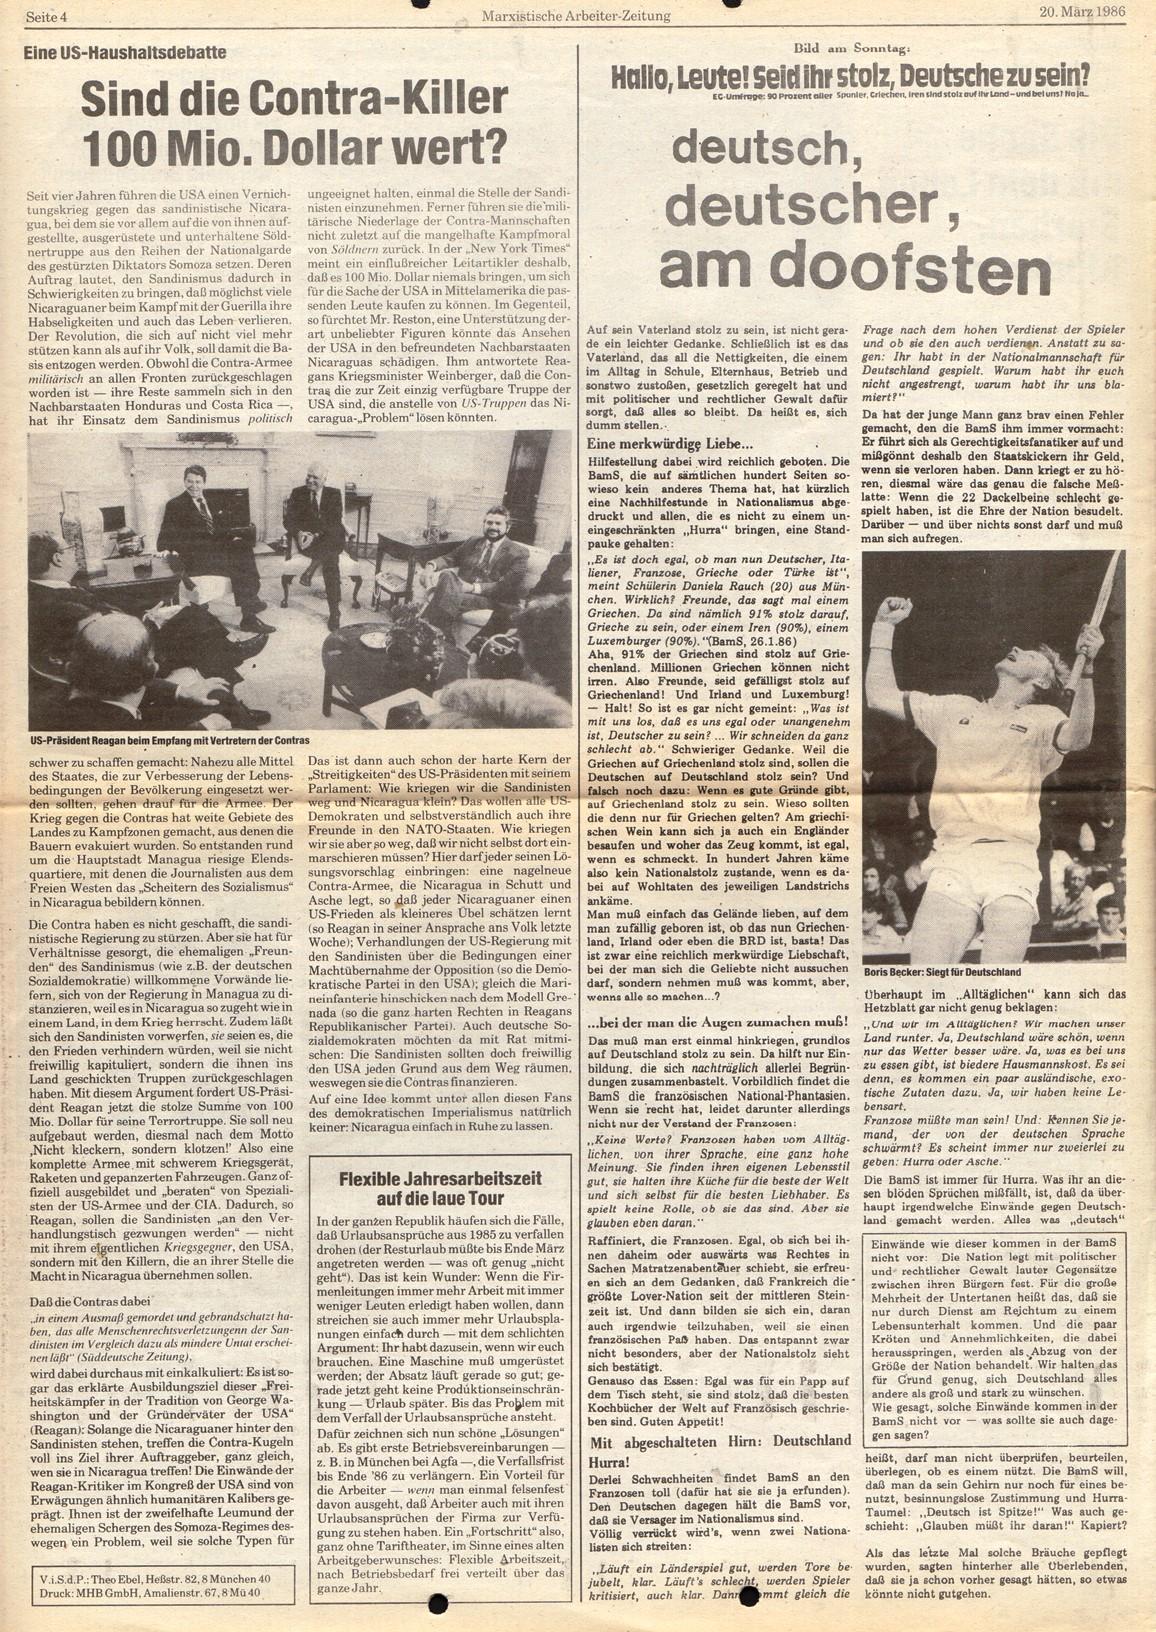 Muenchen_MG_MAZ_AGFA_19860320_04